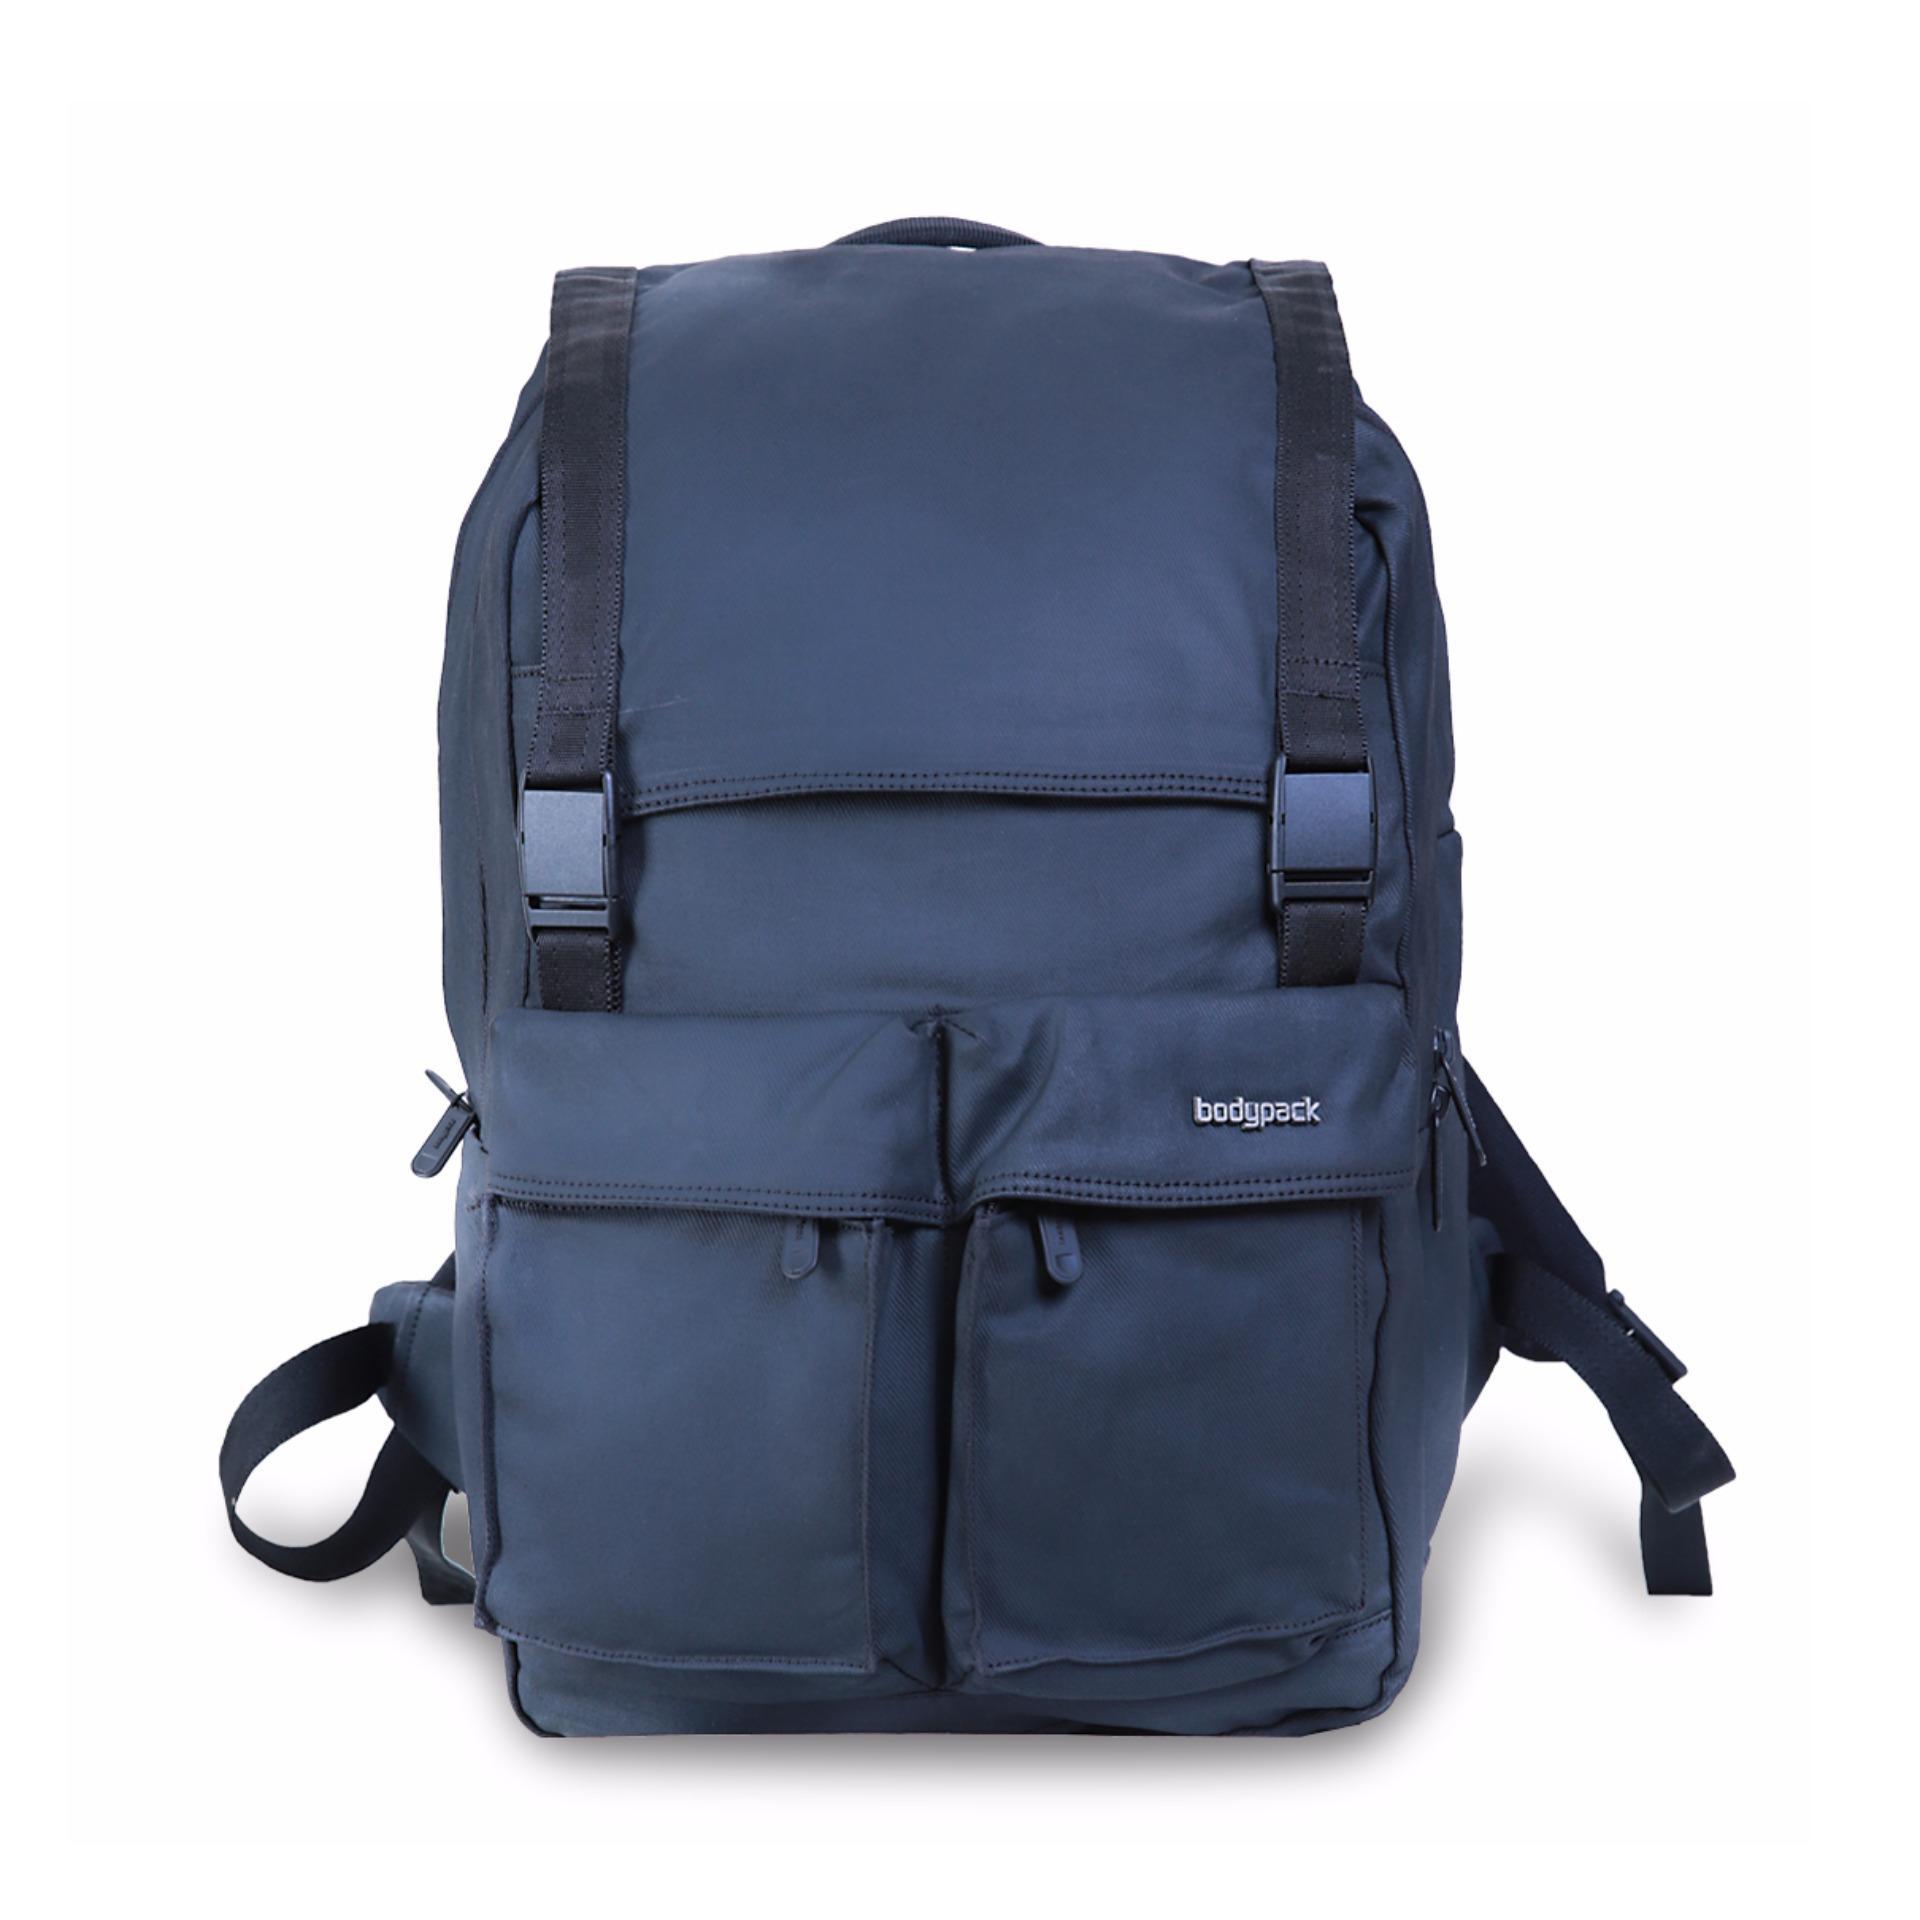 Bodypack Rlt14 Neo Botulinum Hitam Daftar Harga Terkini Dan Tsi Pad Loader 021 Trimmer Updated Price List Source Companion 40 3logic Tab Abu